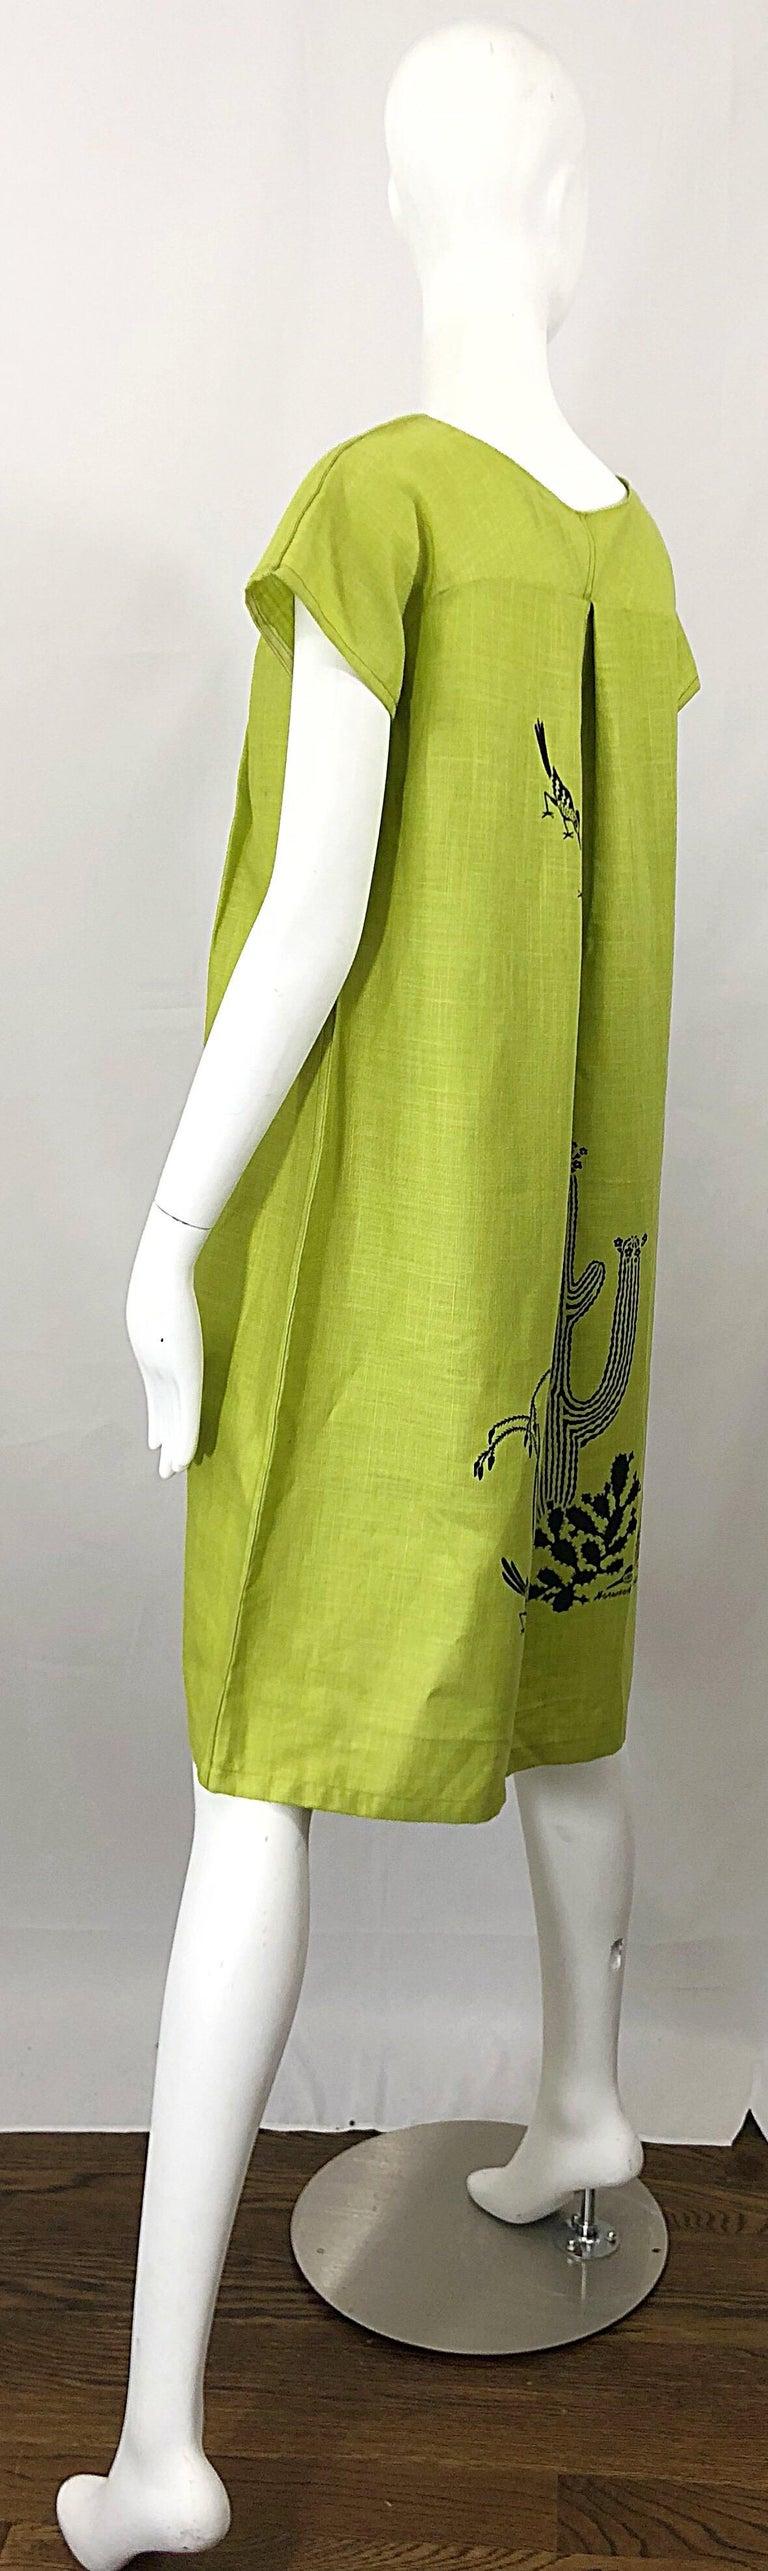 Rare 1970s Harwood Steiger Screen Printed Ant Eater Novelty Linen Tunic Dress For Sale 10